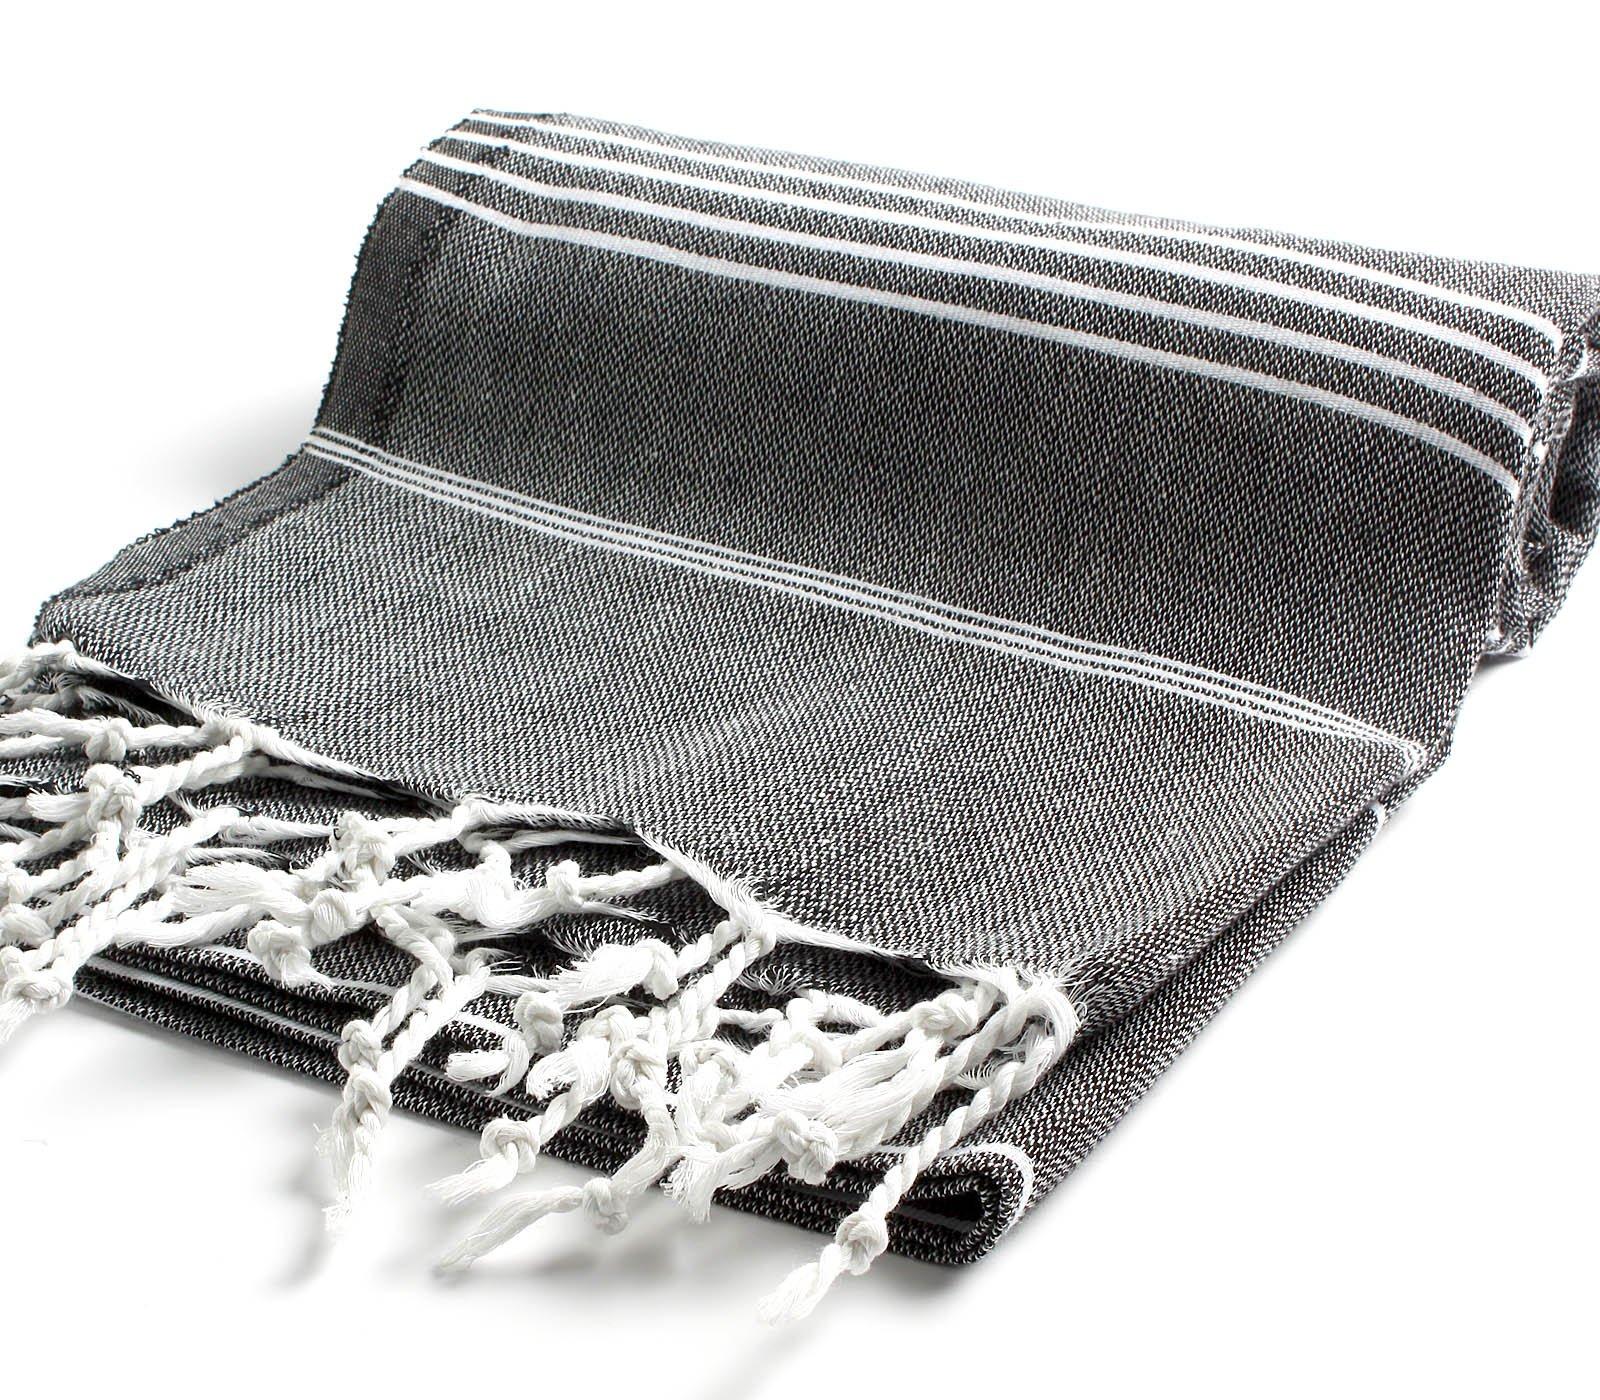 Cacala 100% Cotton Pestemal Turkish Bath Towel, 37 x 70, Black